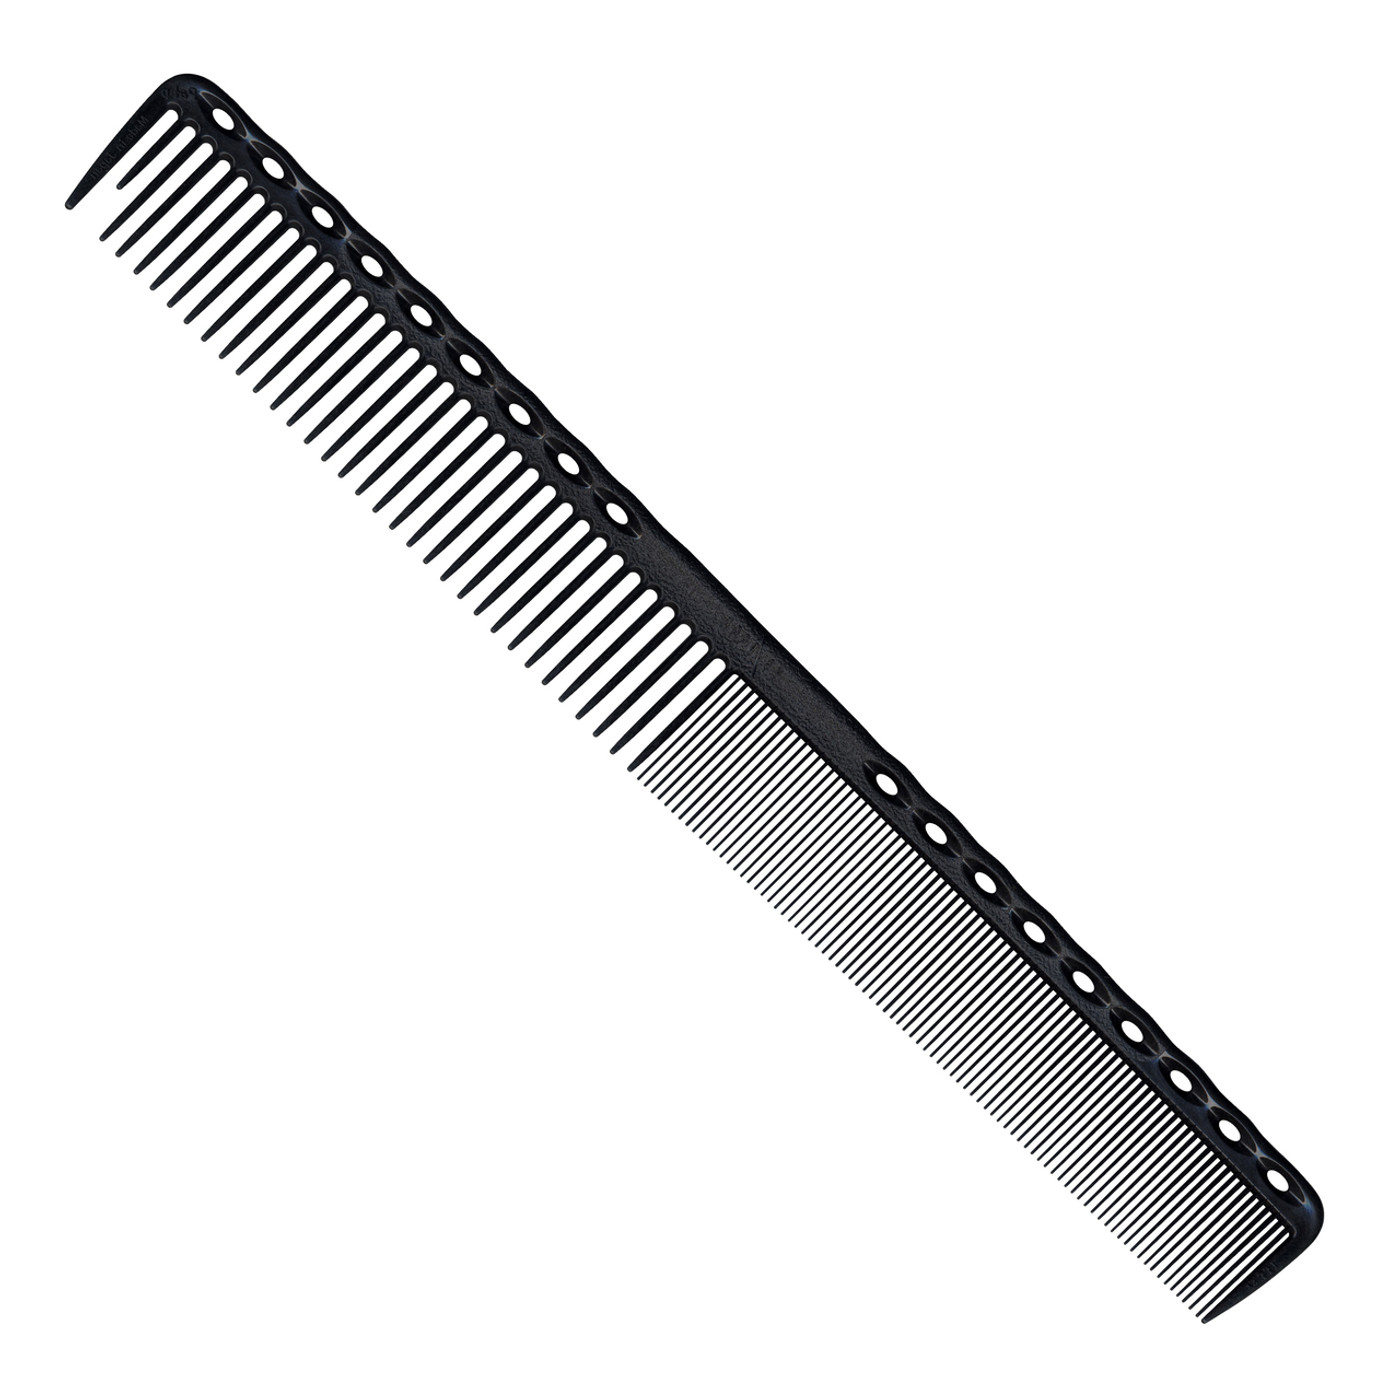 YS Park 331 Super Long Cutting Comb - Carbon Black